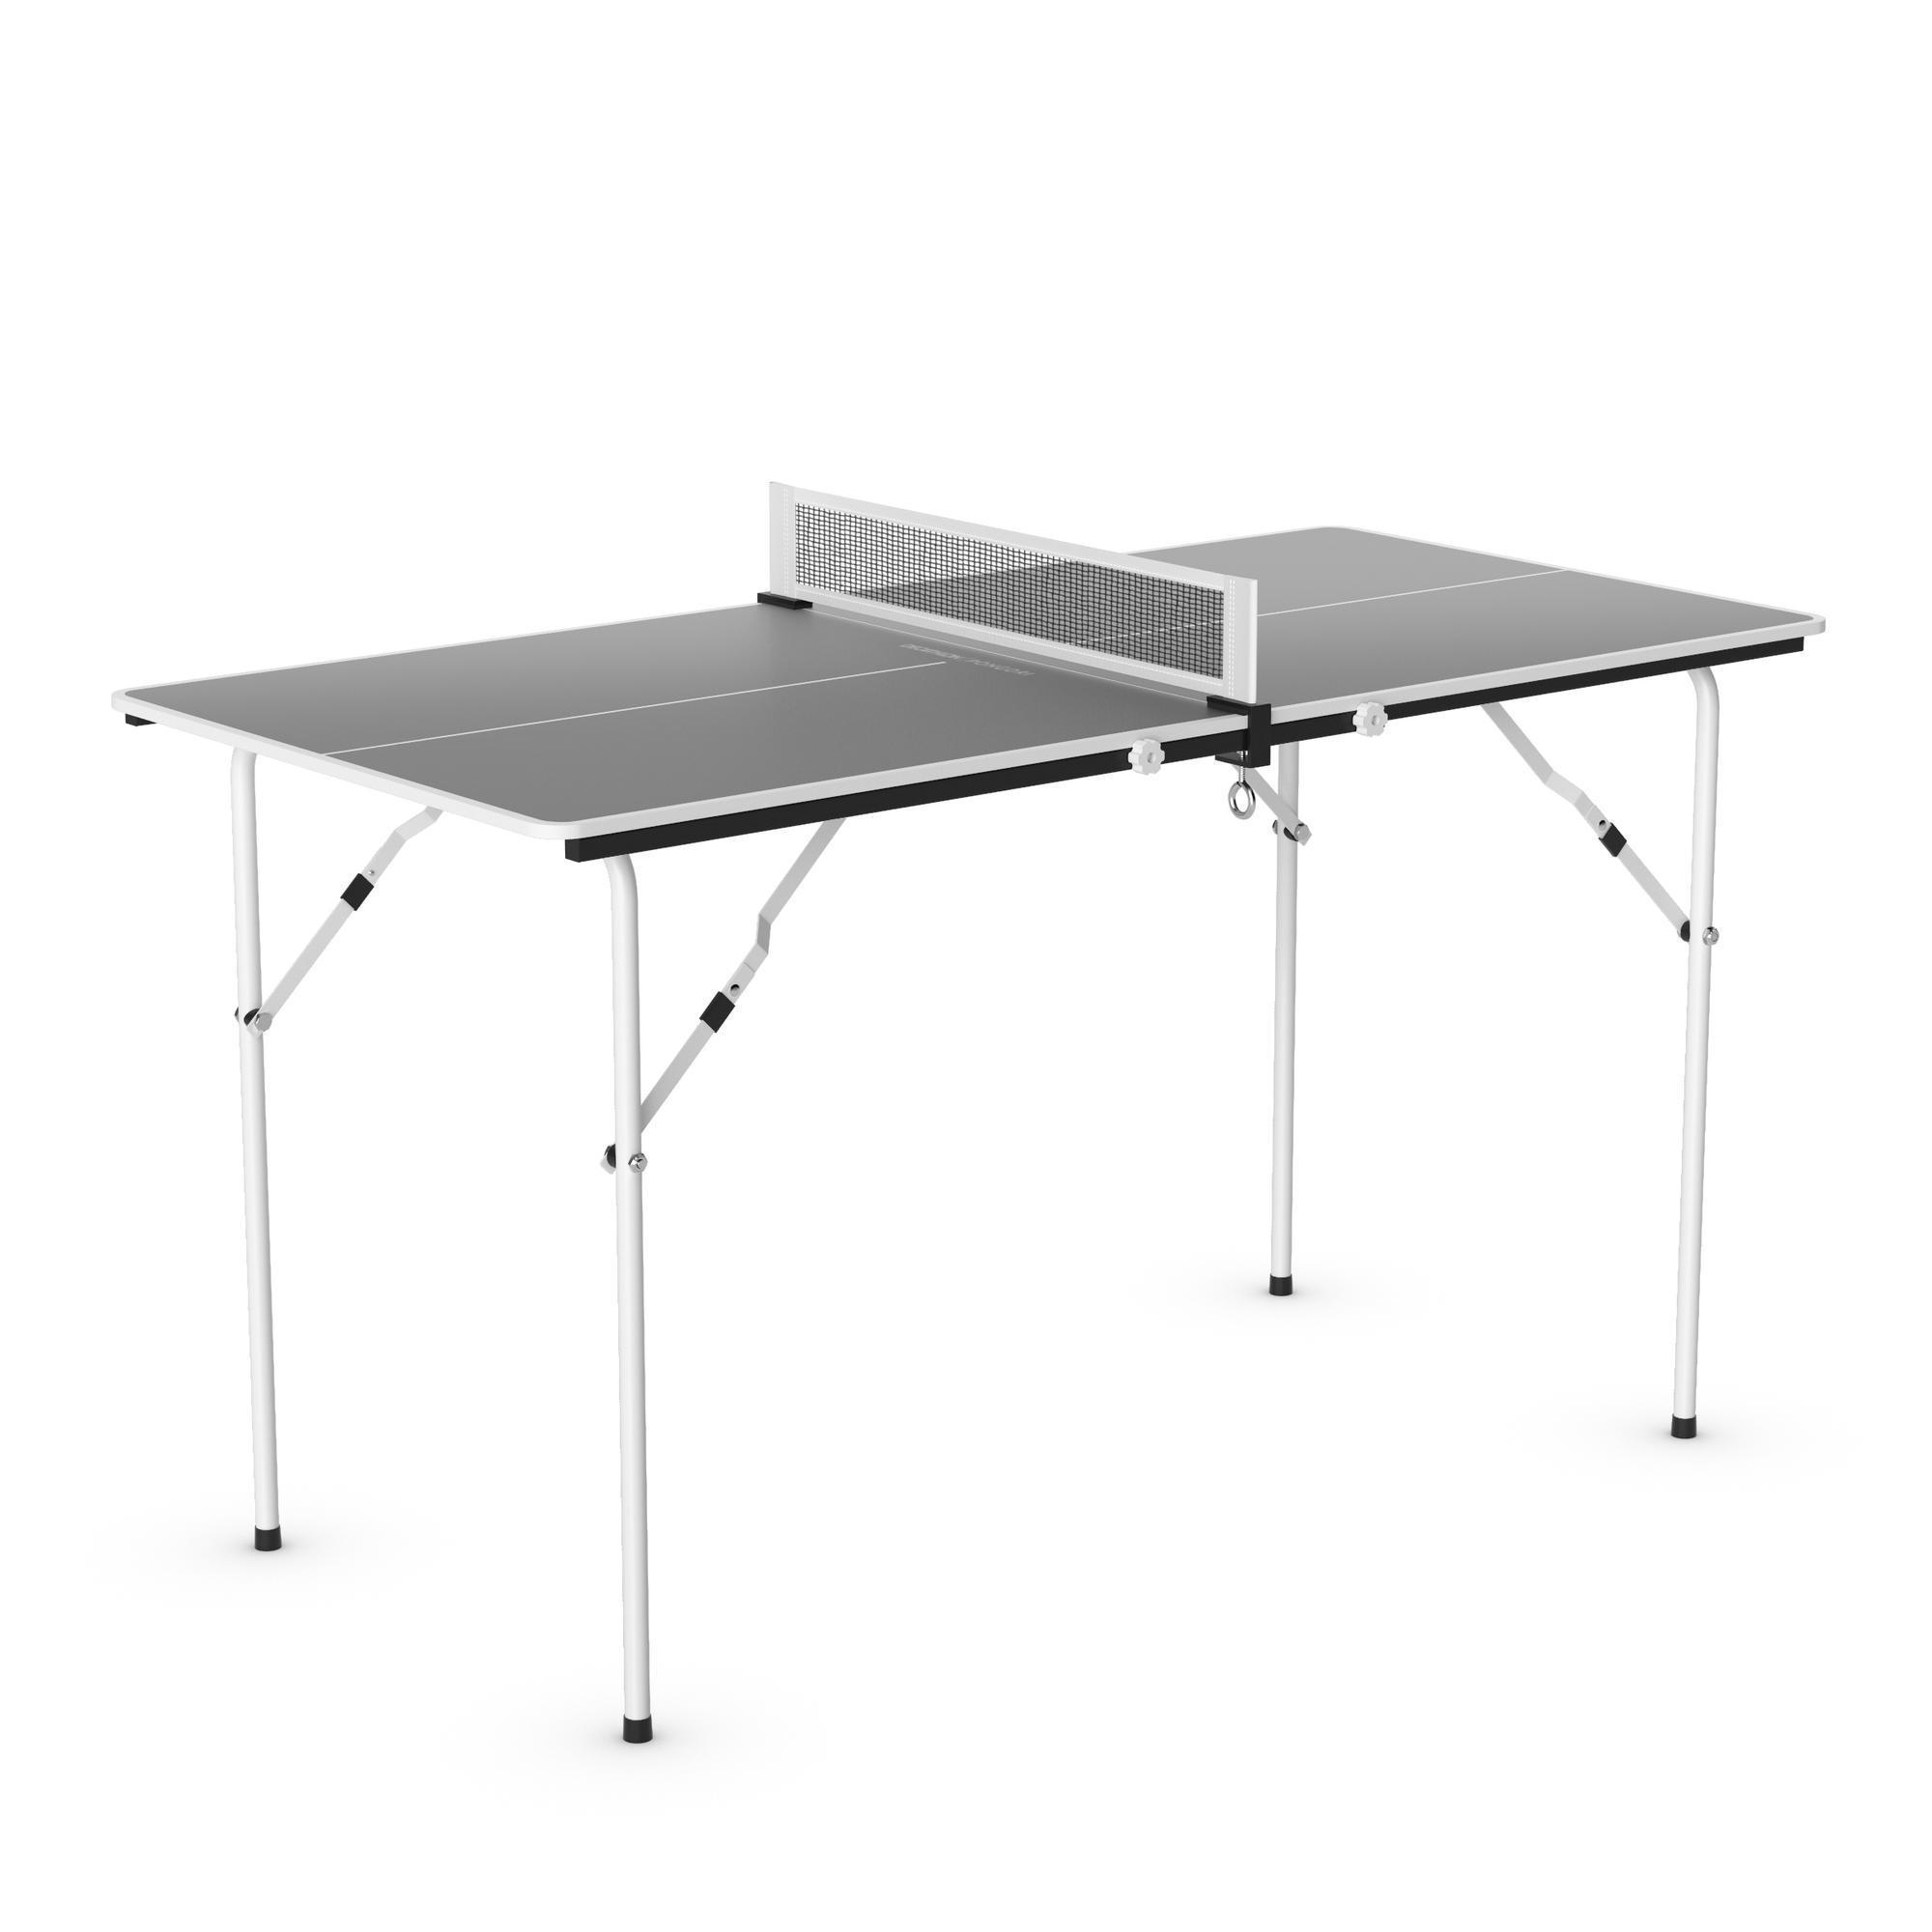 Fabulous Tables Indoor Decathlon Home Interior And Landscaping Oversignezvosmurscom